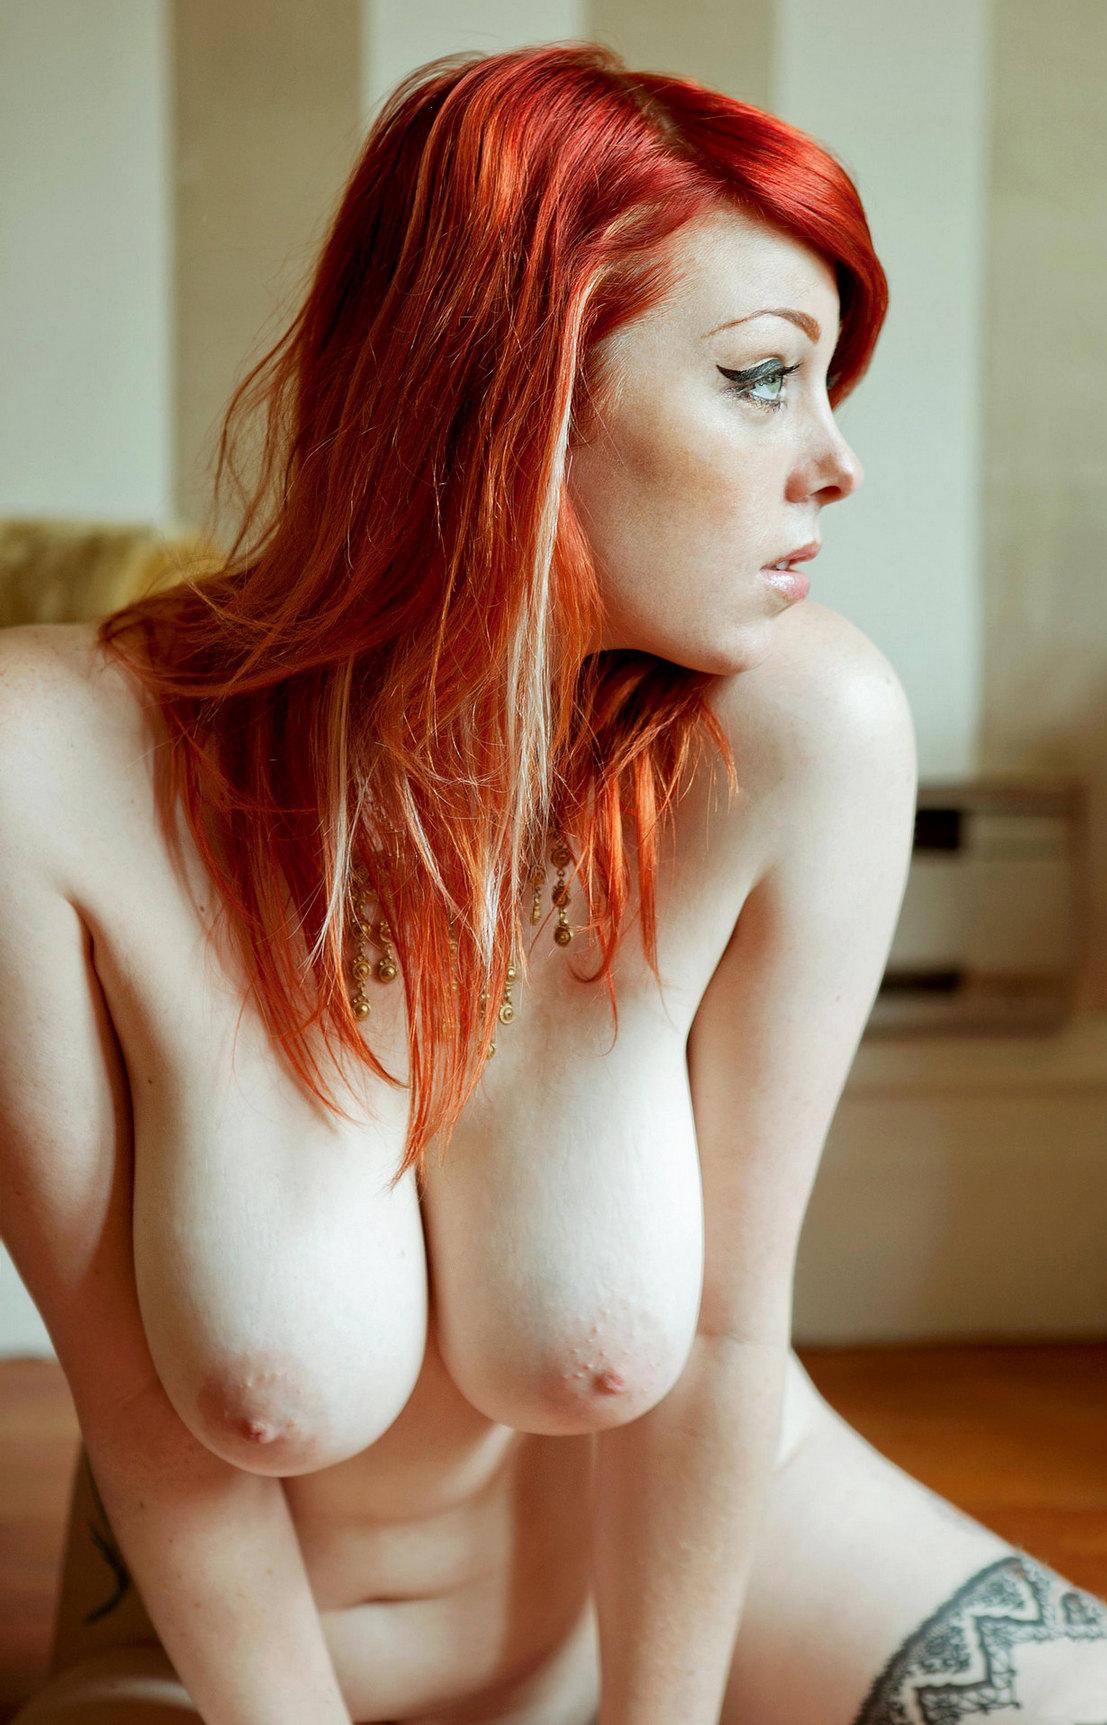 tit redheads big Naked